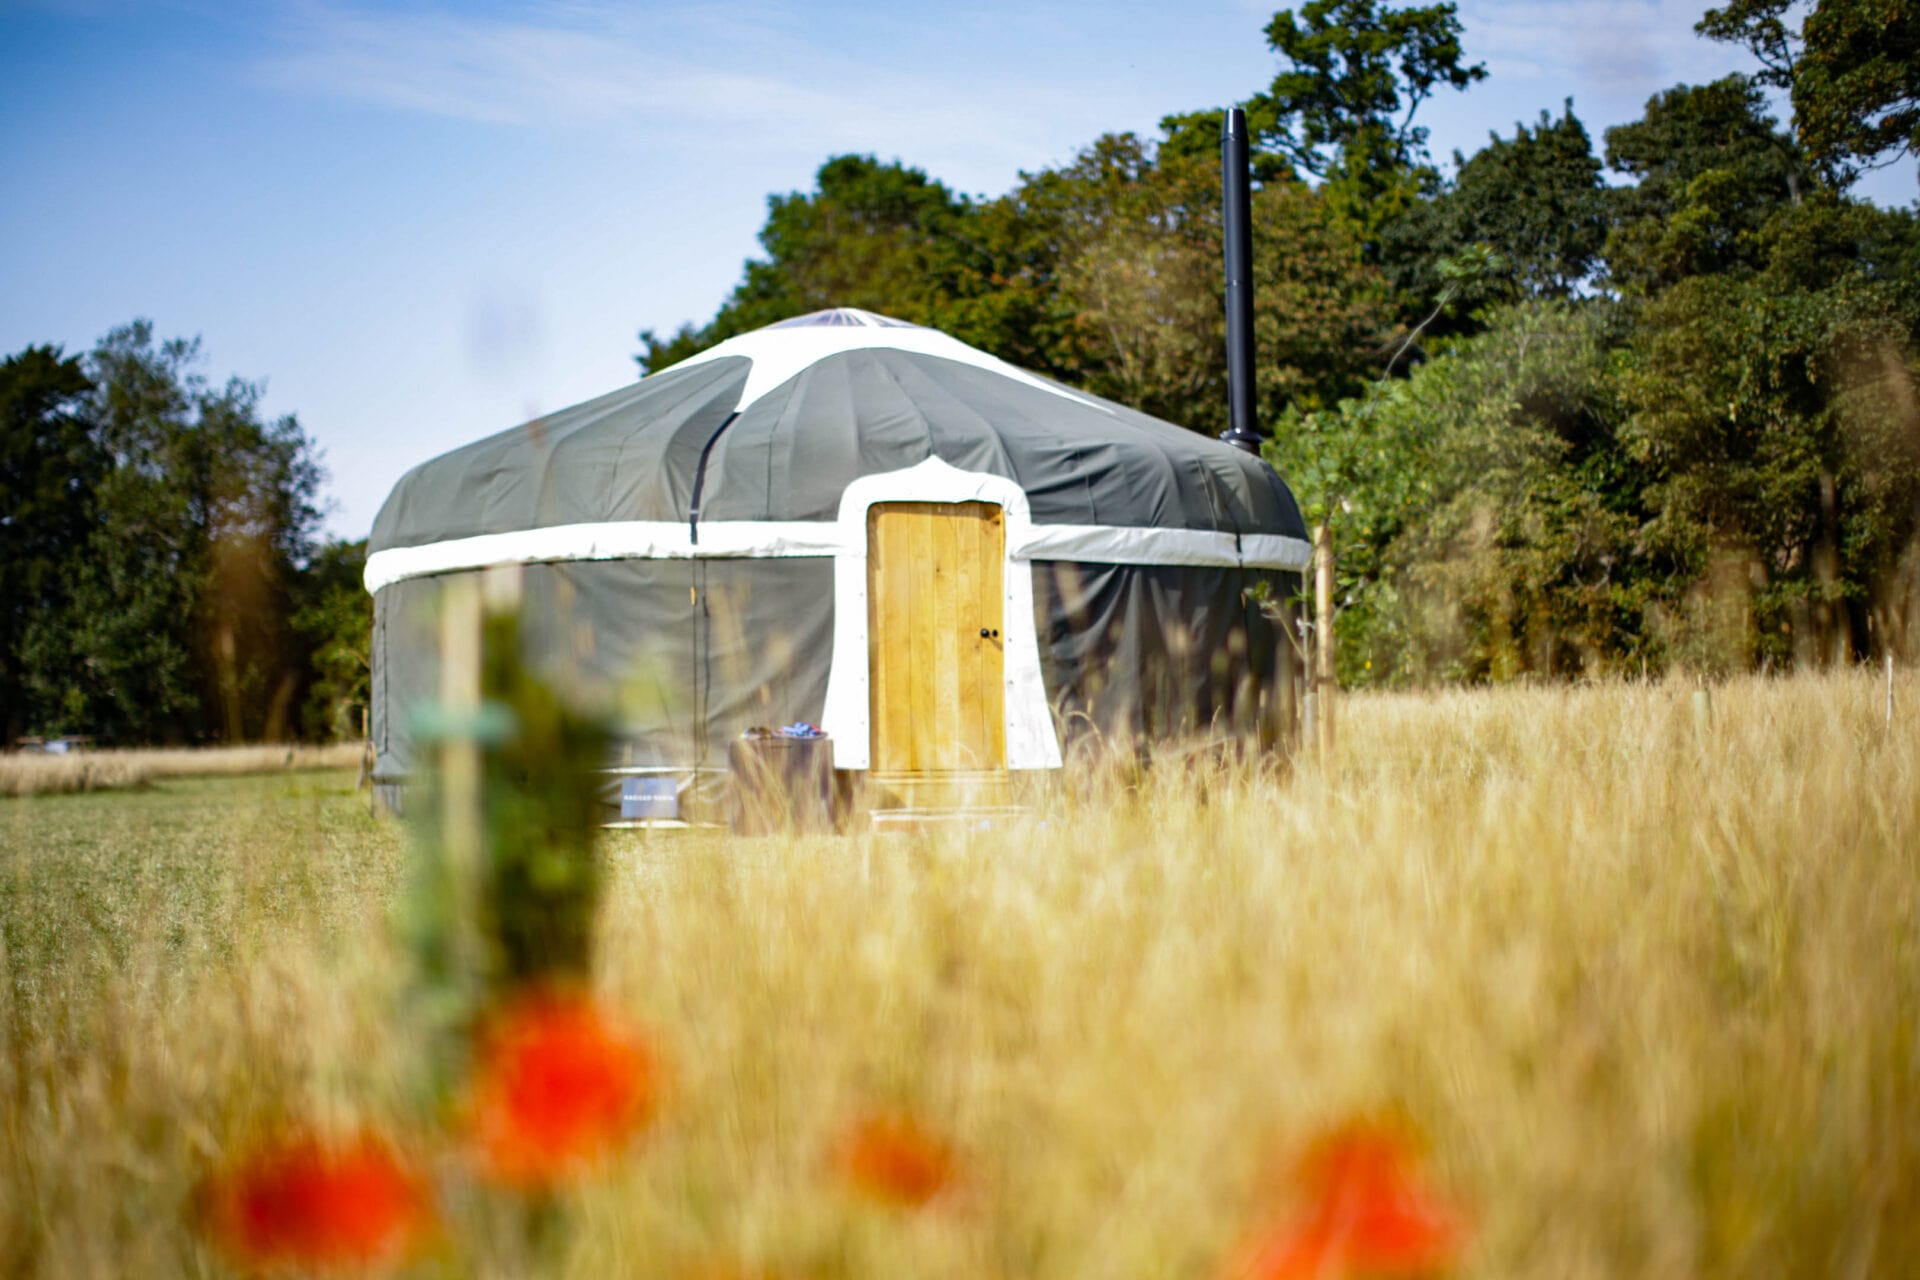 grey-yurt-in-long-grass-field-in-summer-at-wild-meadow-raynham-estate